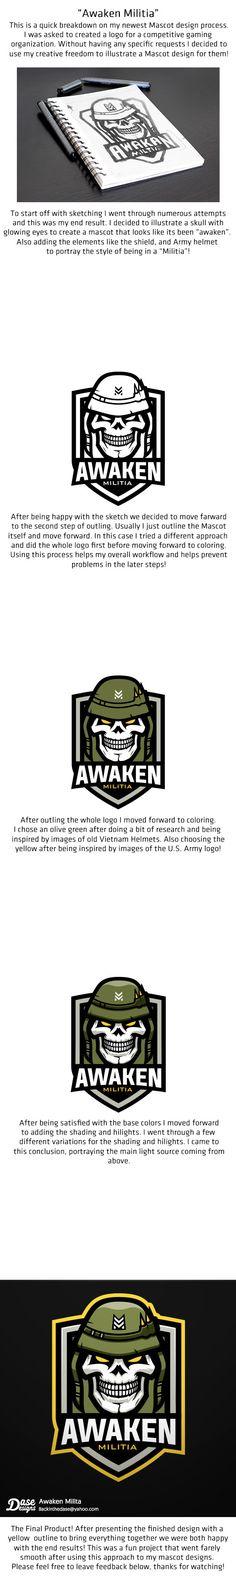 Awaken Militia (Case Study) on Behance